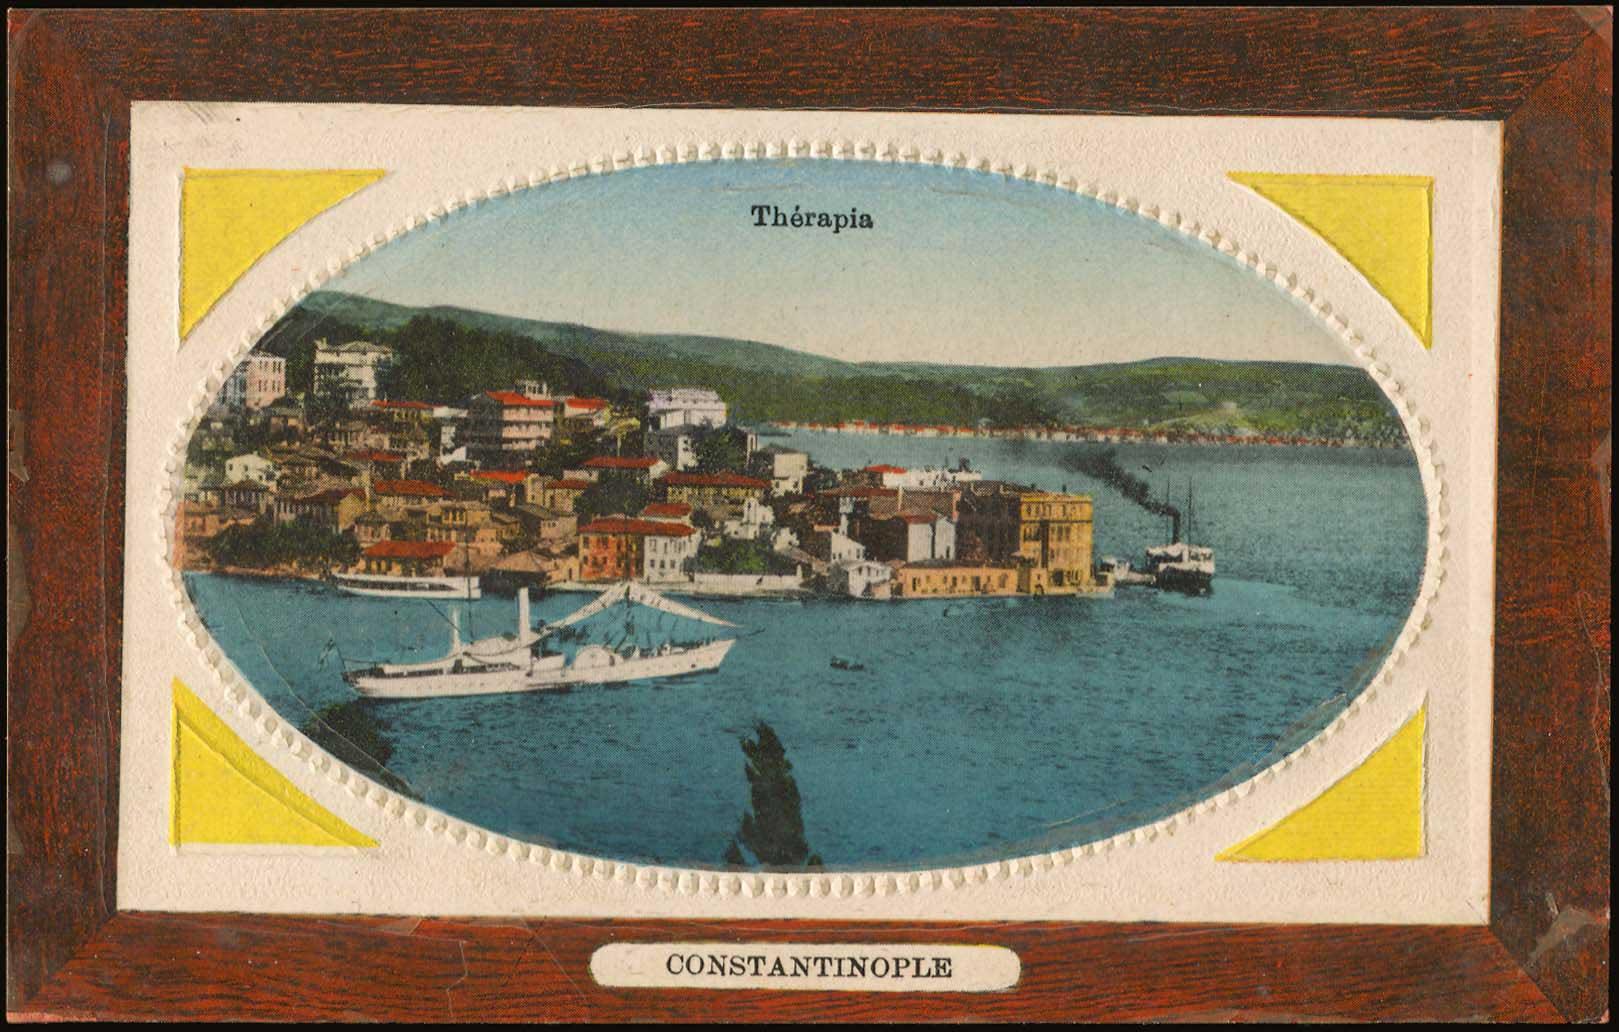 Lot 1737 - -  PICTURE POSTCARDS SMYRNE, CONSTANTINOPLE, ASIA MINOR -  A. Karamitsos Public & Live Internet Auction 675